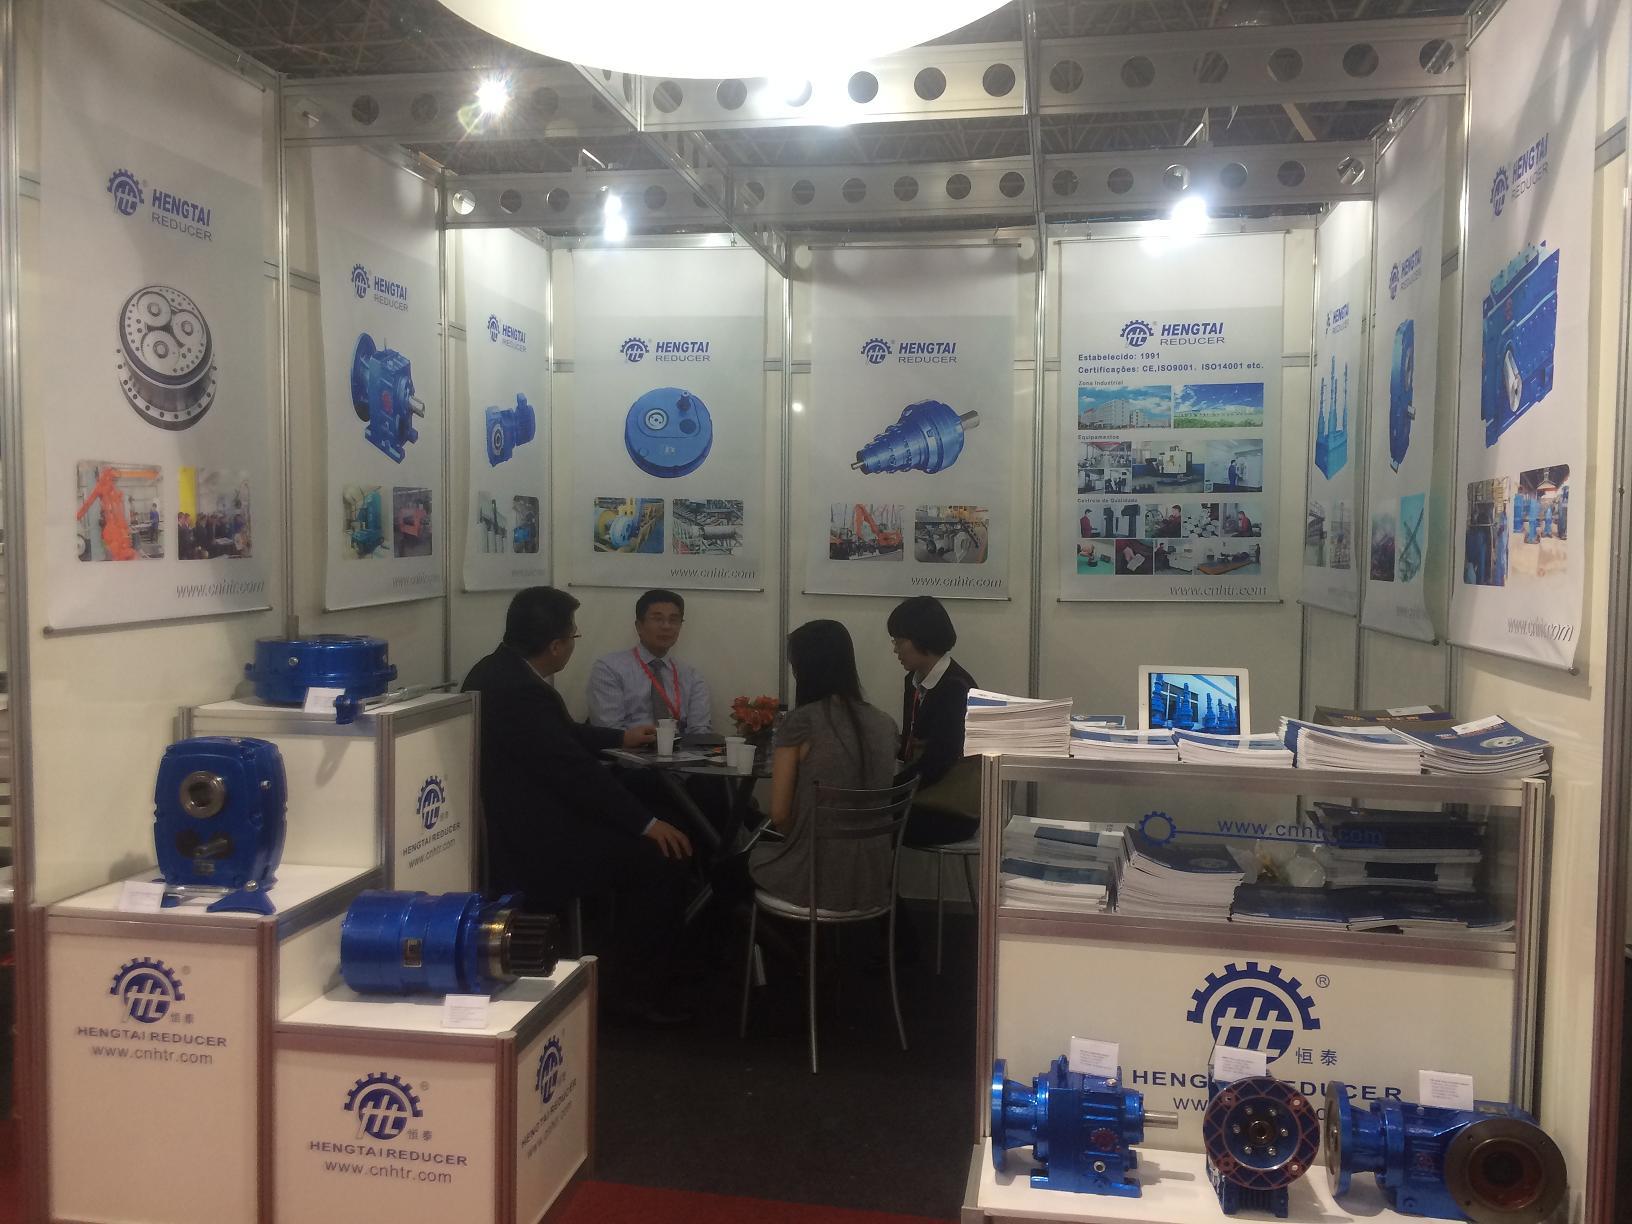 Hengtai reducer Exhibitions Mecanica Brazil